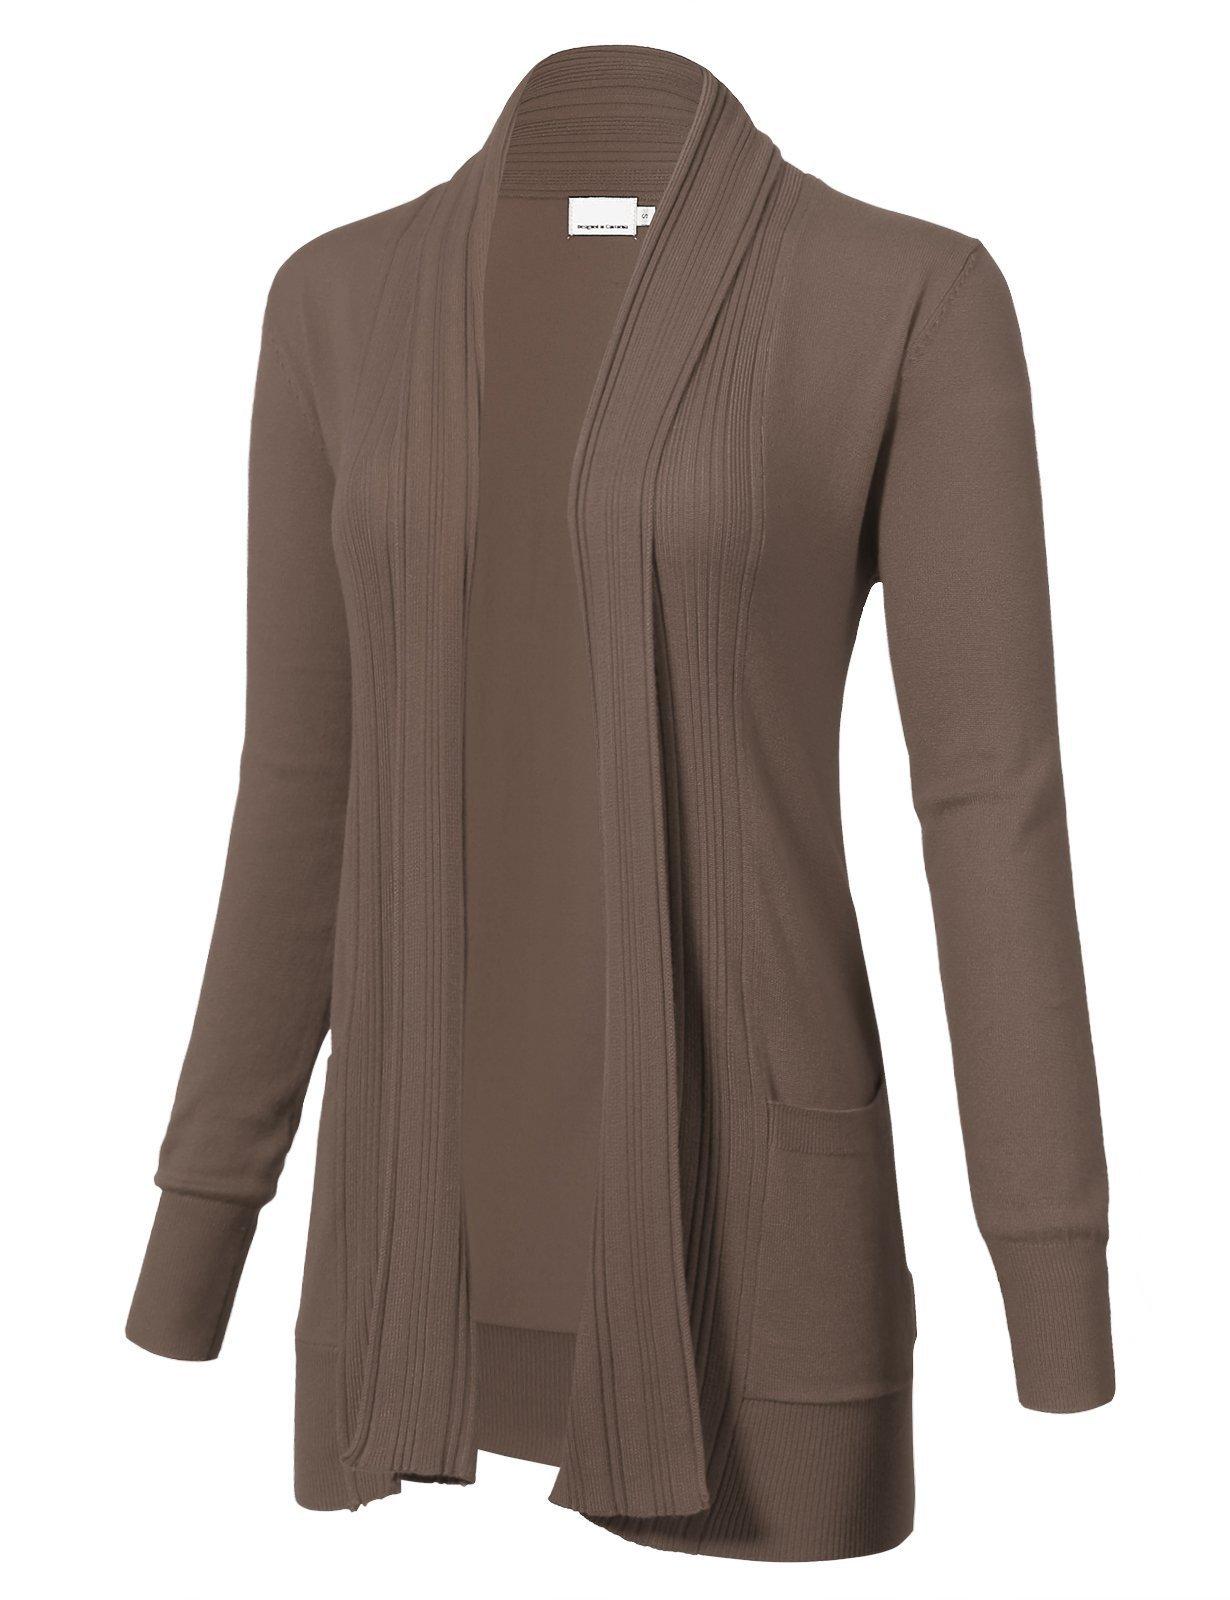 ARC Studio Women's Long Sleeve Open Front Draped Cardigans Pocket XL Camel